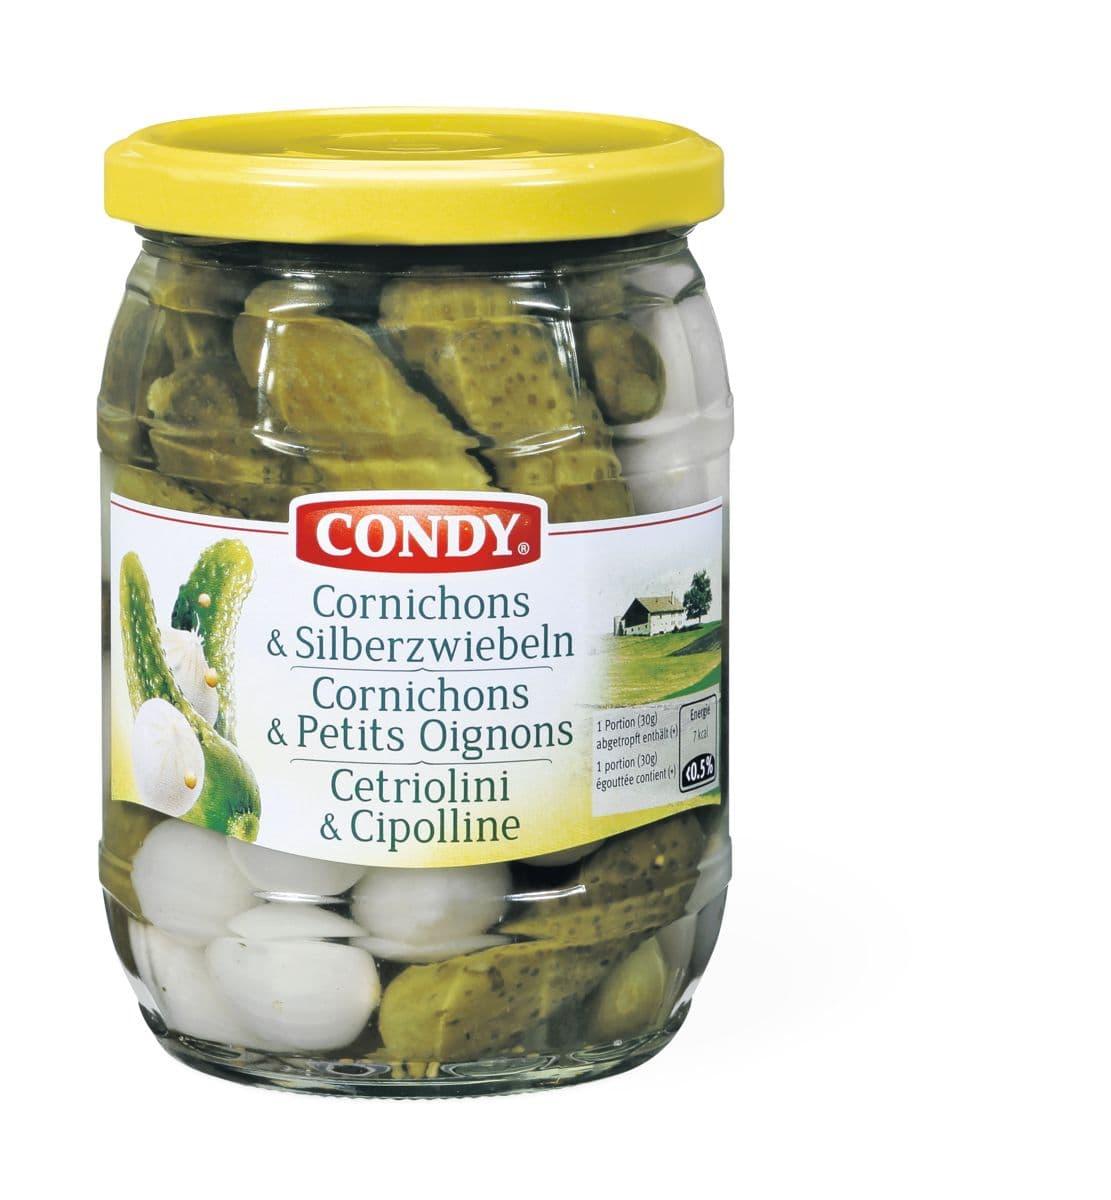 Condy Cornichons Silberzwiebeln